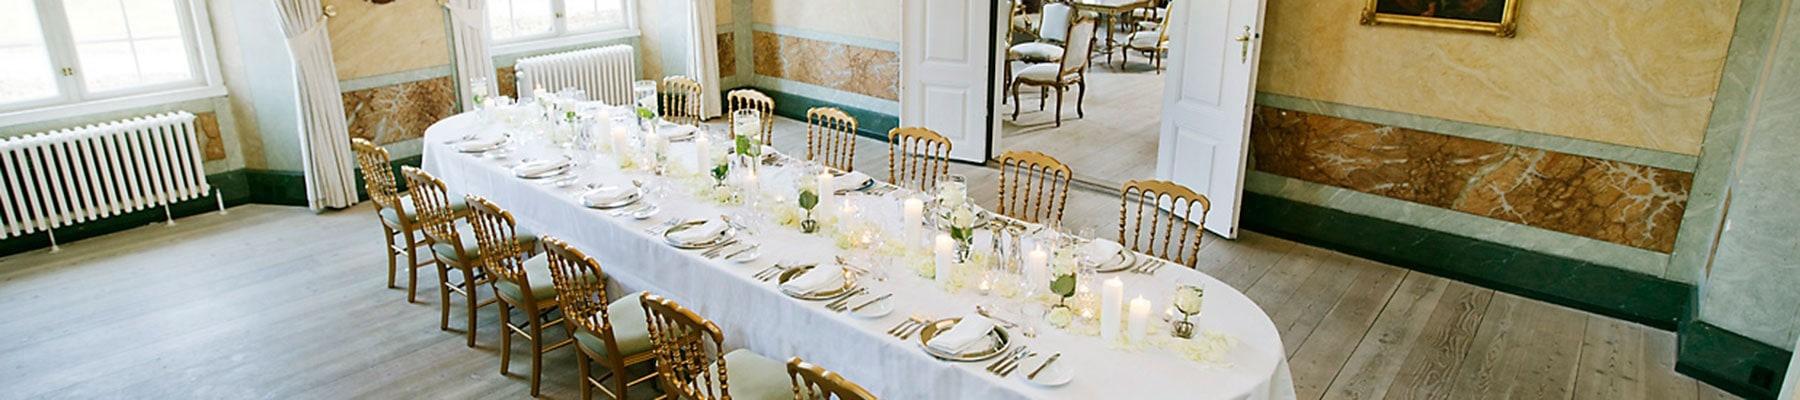 Lyse konferencelokaler på Fyn Holckenhavn Slot